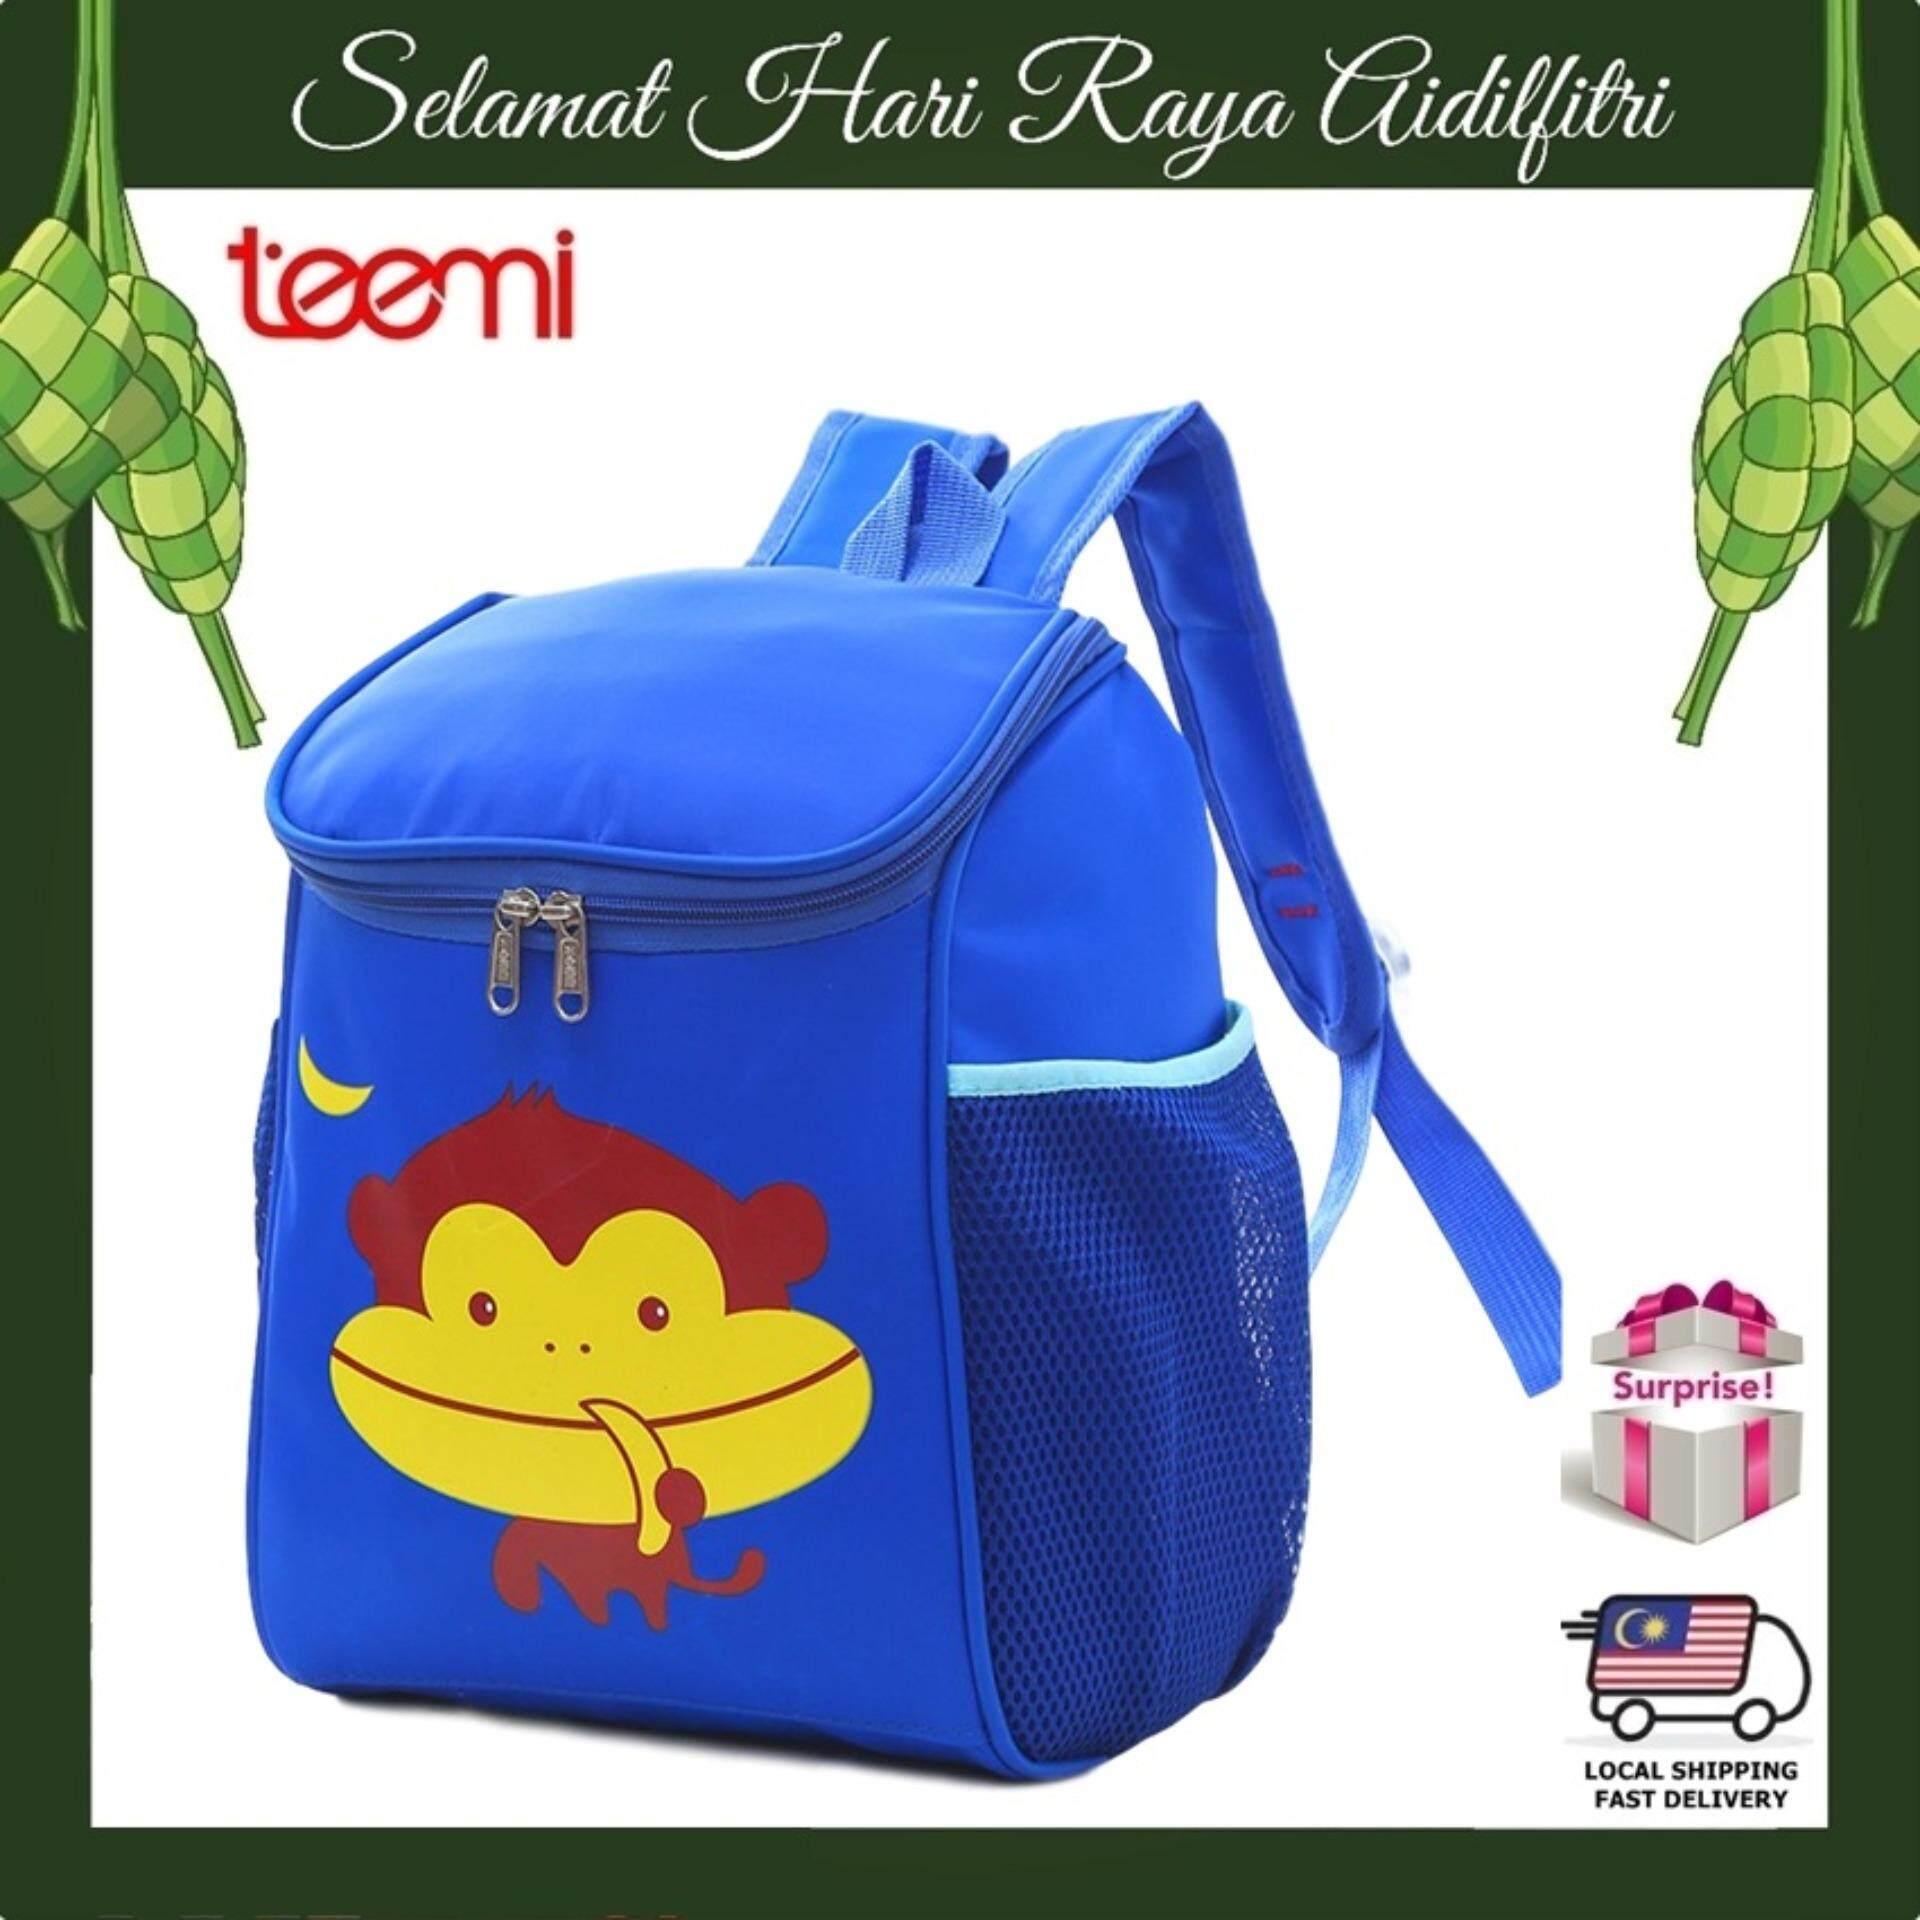 TEEMI Cartoon Animal School Bag Candy Colors Backpack Nursery Kindergarten Kids Children Toddler